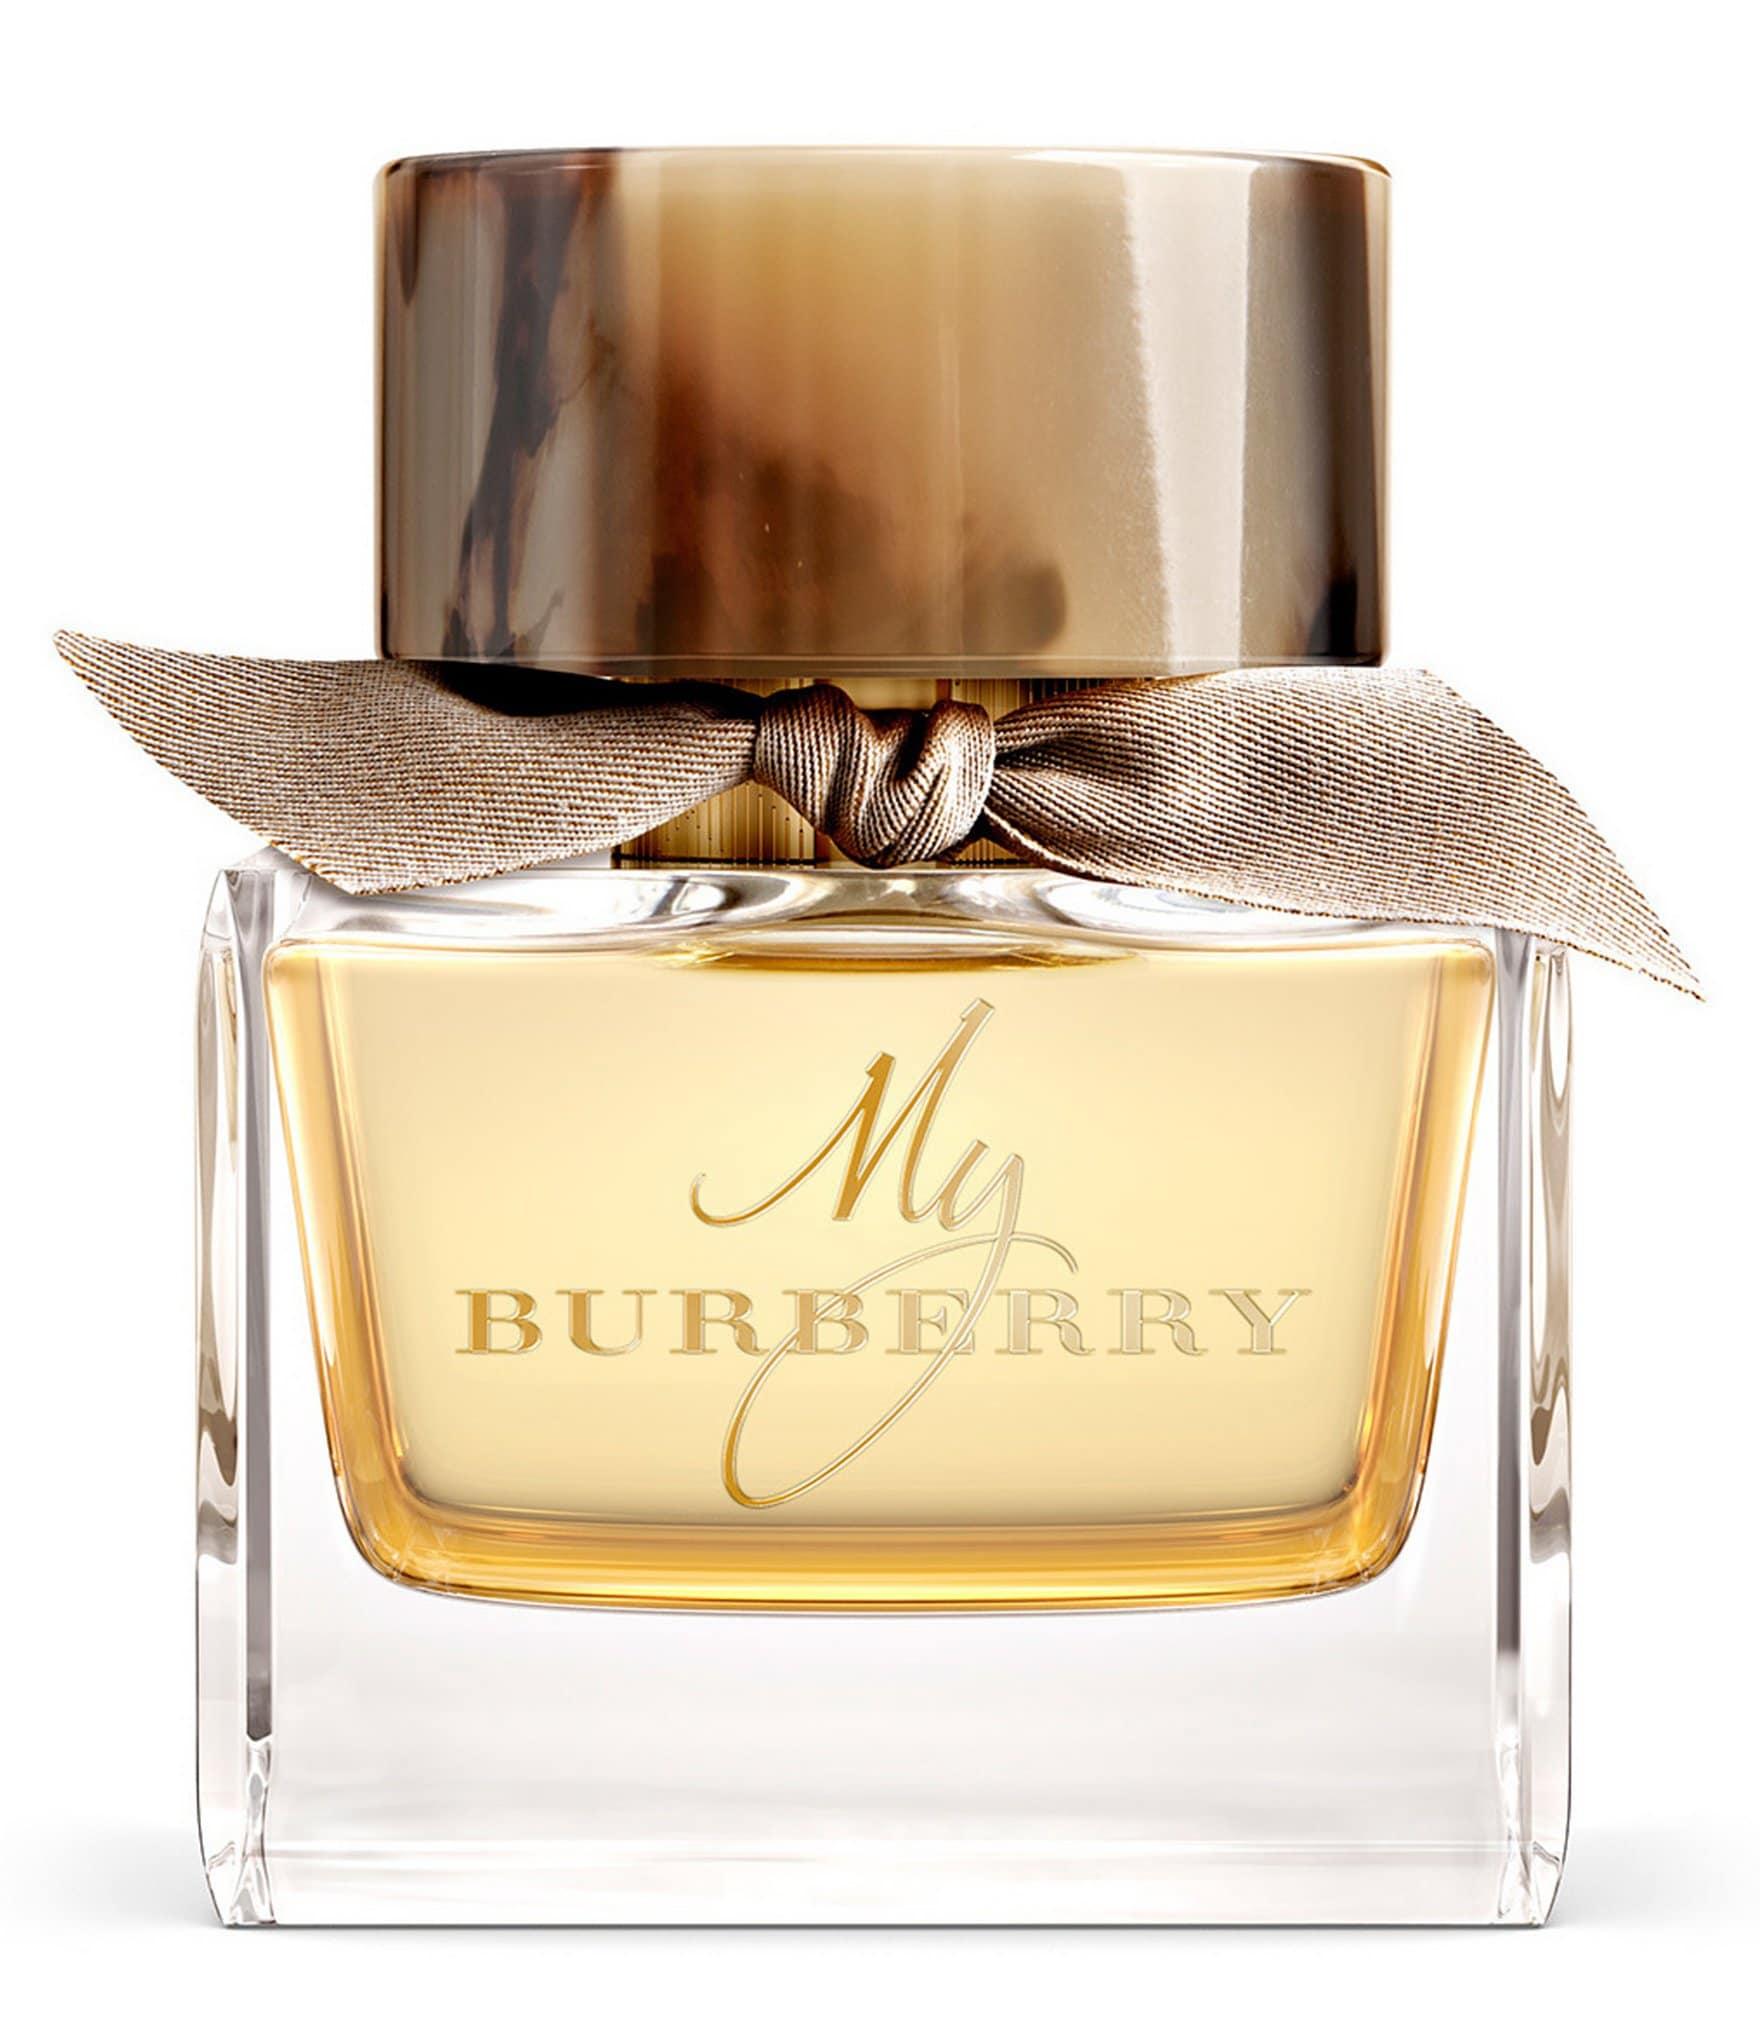 Burberry My Burberry Eau de Parfum Spray | Dillard's